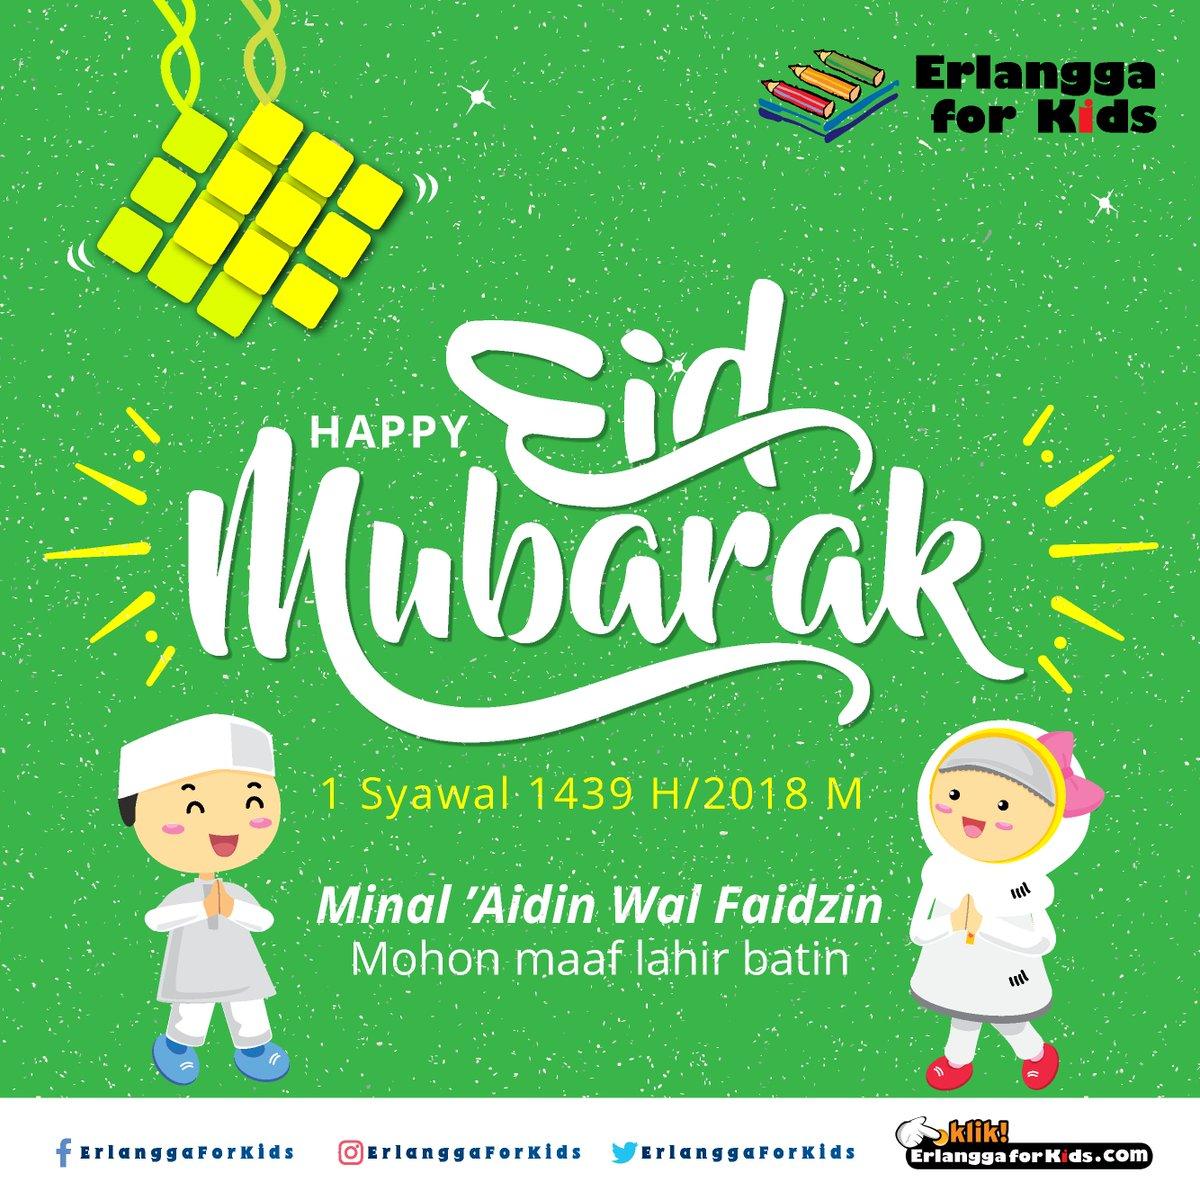 Erlangga For Kids در توییتر Happy Eid Mubarak 1 Syawal 1439 H Minal Aidin Wal Faidzin Mohon Maaf Lahir Batin Erlanggaforkids Idulfitri1439h Happyeidmubarak Https T Co Ijxk3armcg